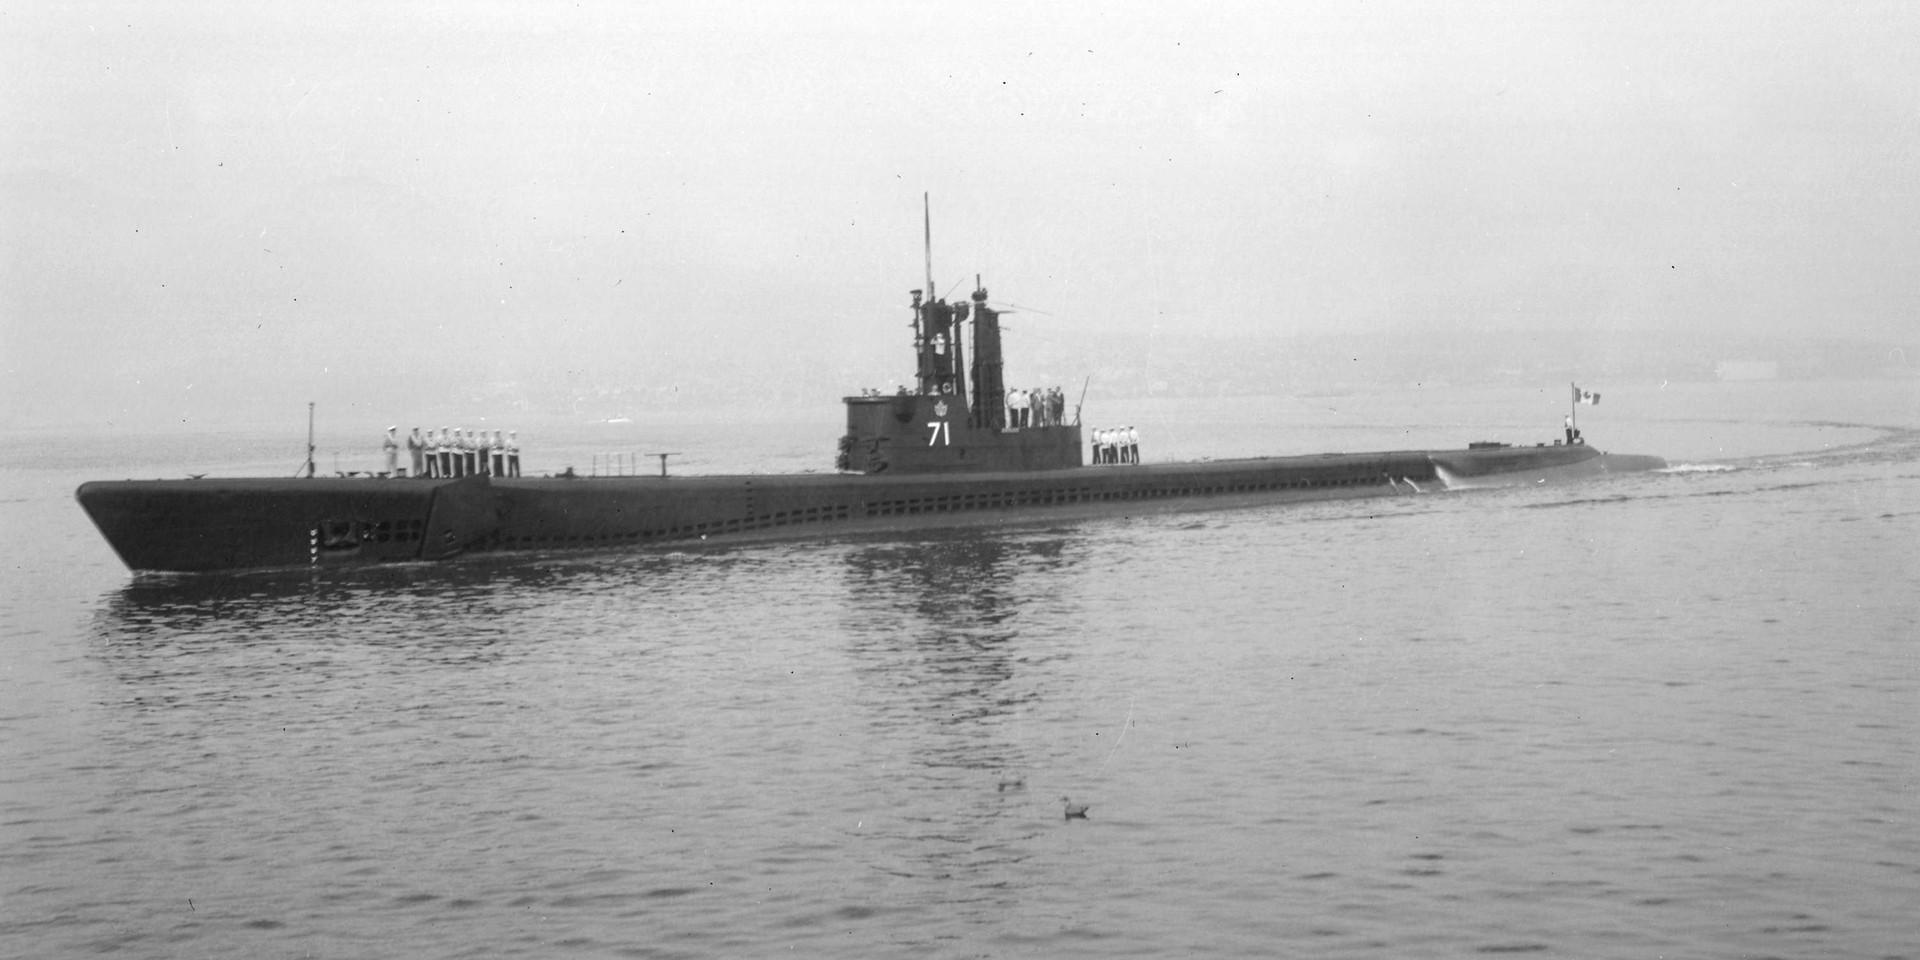 HMCS Grilse (SS-71)